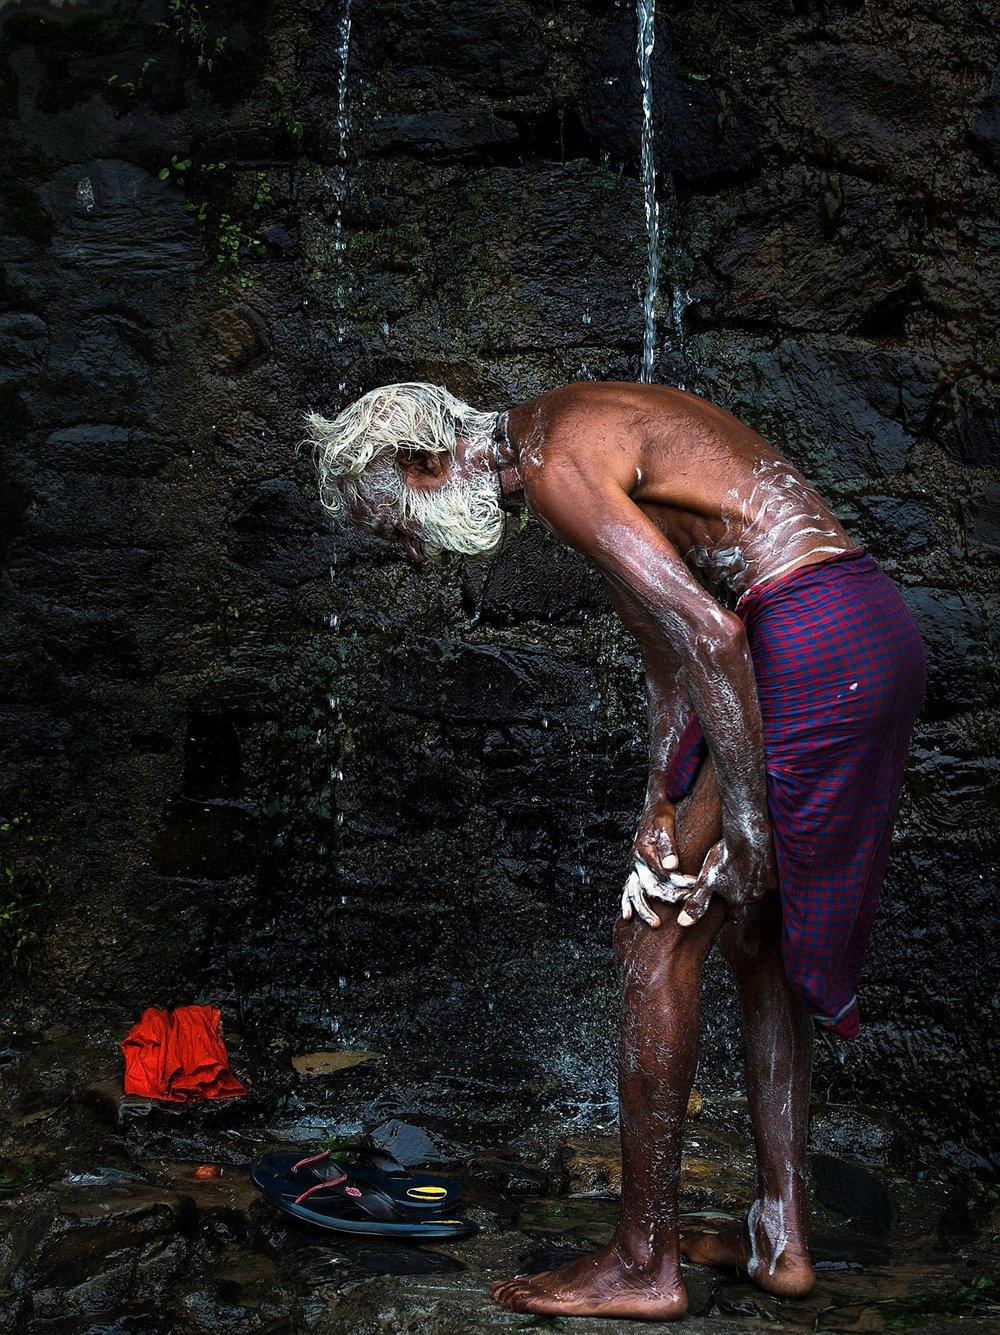 Simon+Needham+Humanitarian+Photography+Nepal+1.jpg